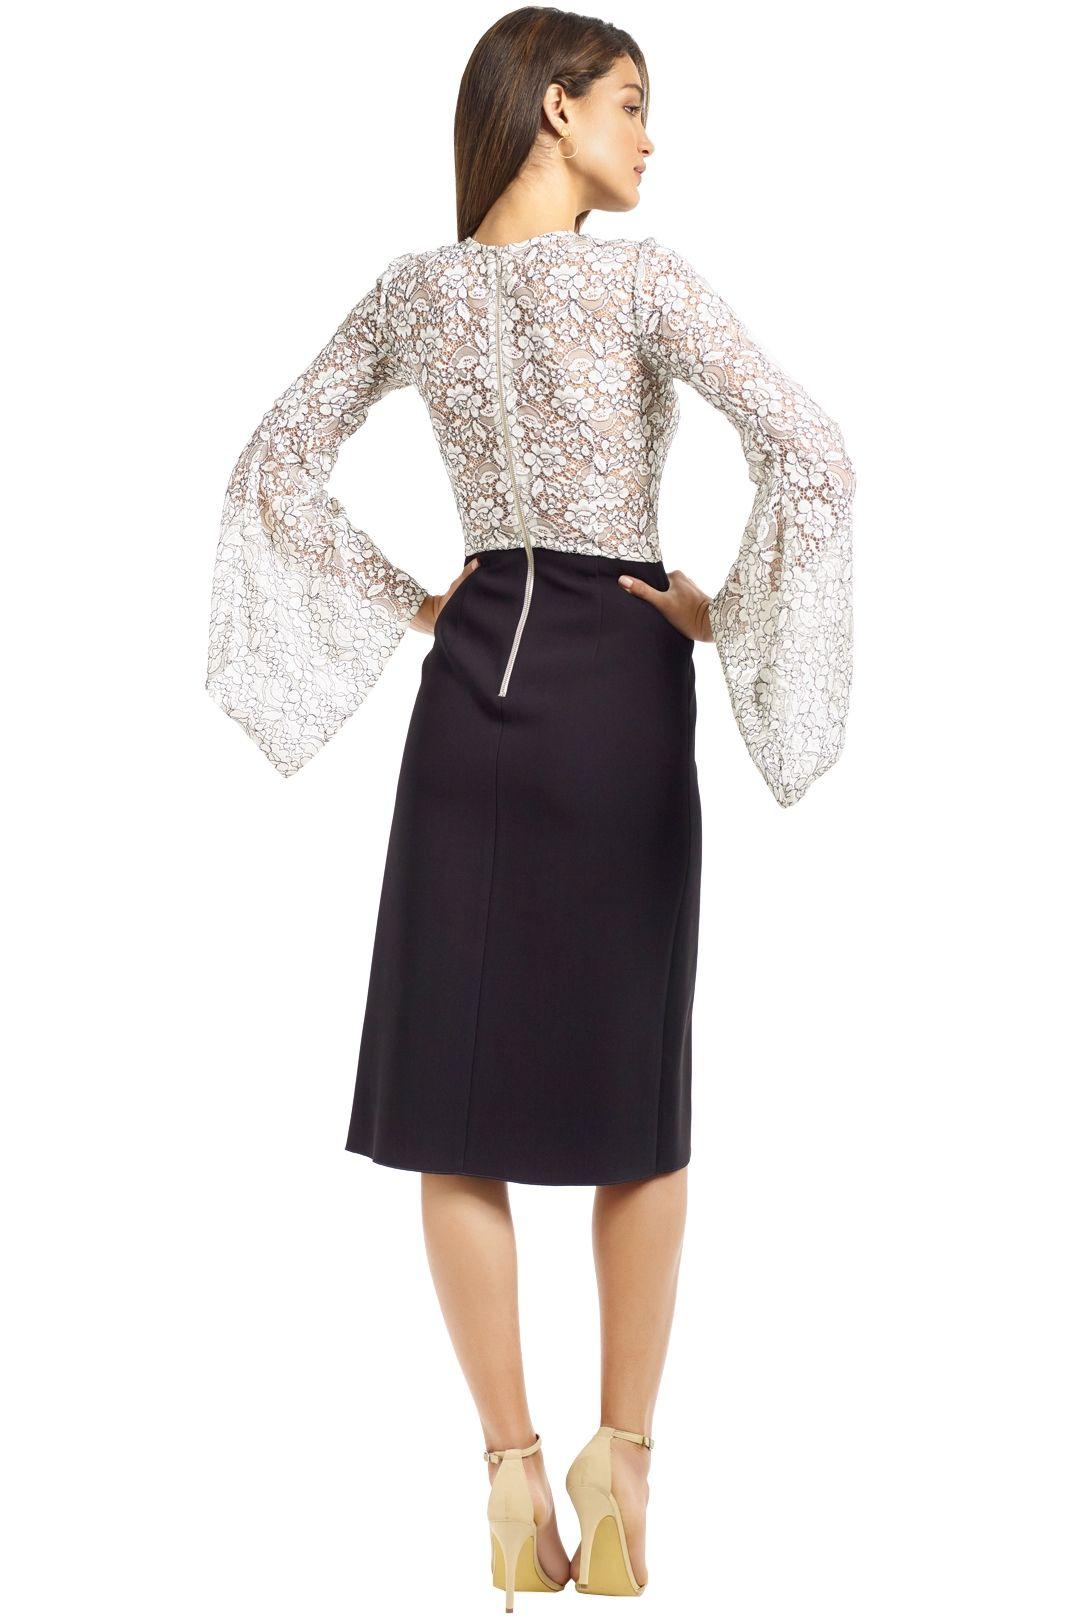 Yeojin Bae - Elise Corded Lace Dress - Black White - Back